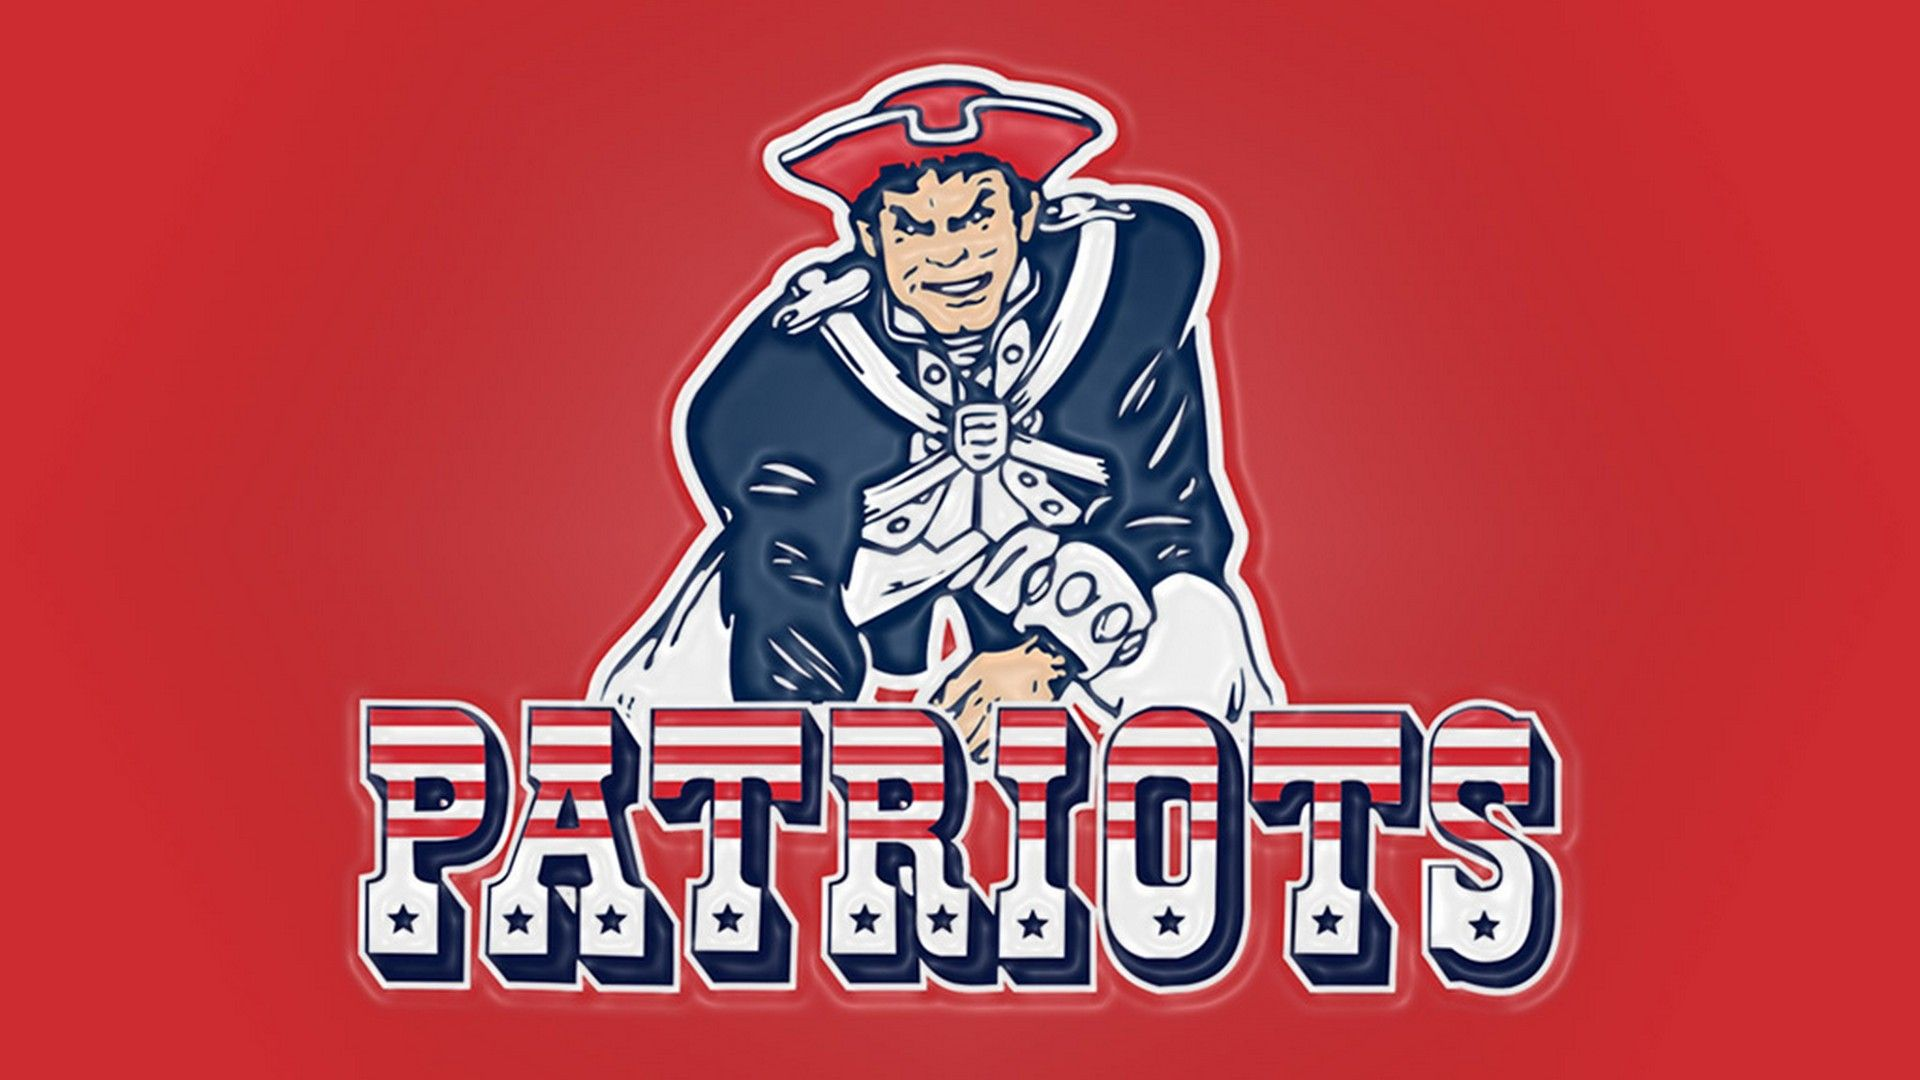 Wallpaper Desktop Patriots Hd 2020 Nfl Football Wallpapers New England Patriots Logo New England Patriots Flag New England Patriots